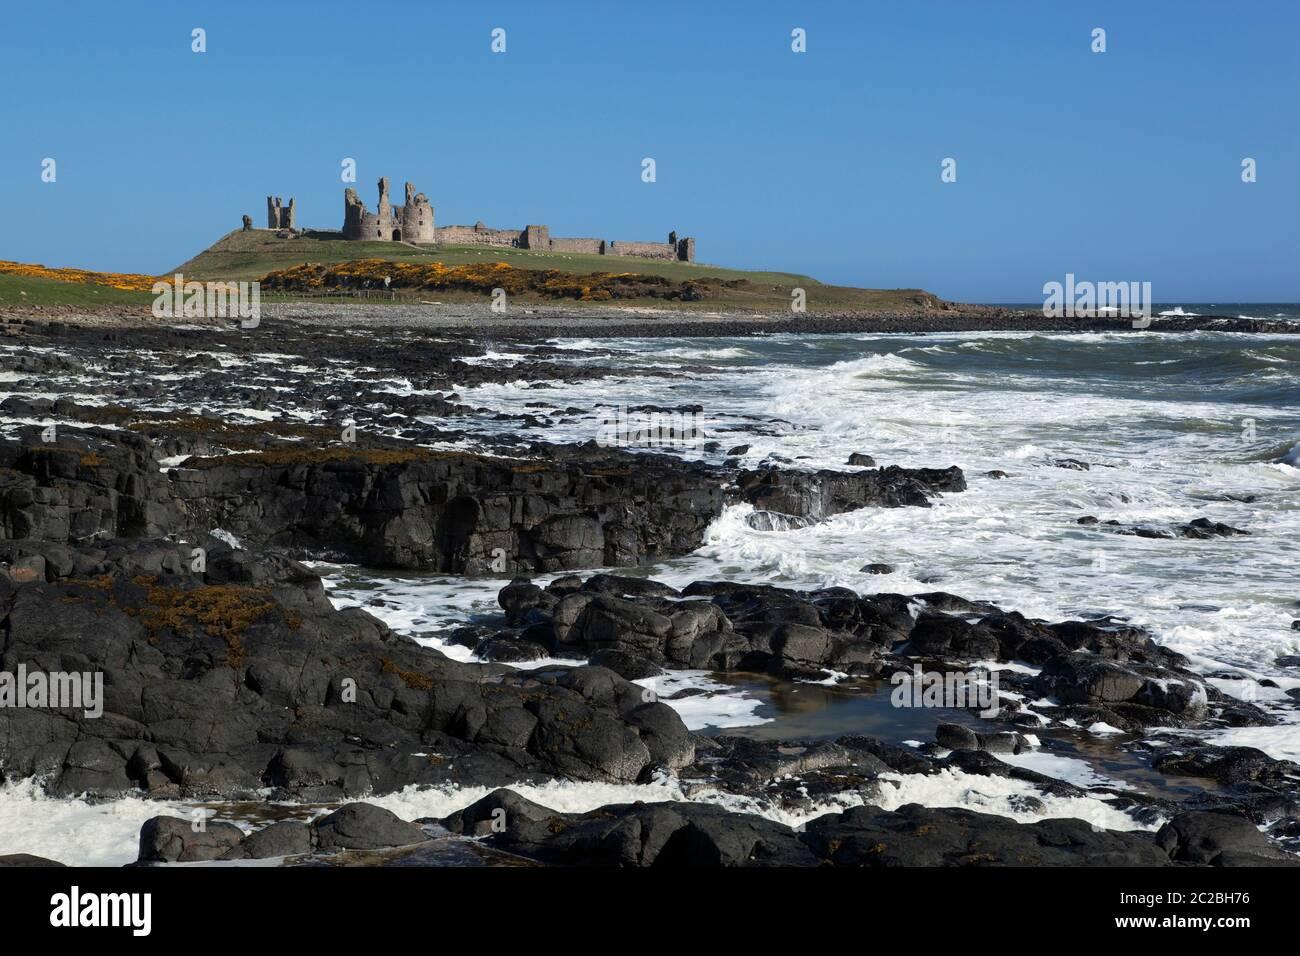 Rough seas below ruins of medieval Dunstanburgh Castle, Alnwick, Northumberland, England, United Kingdom, Europe Stock Photo